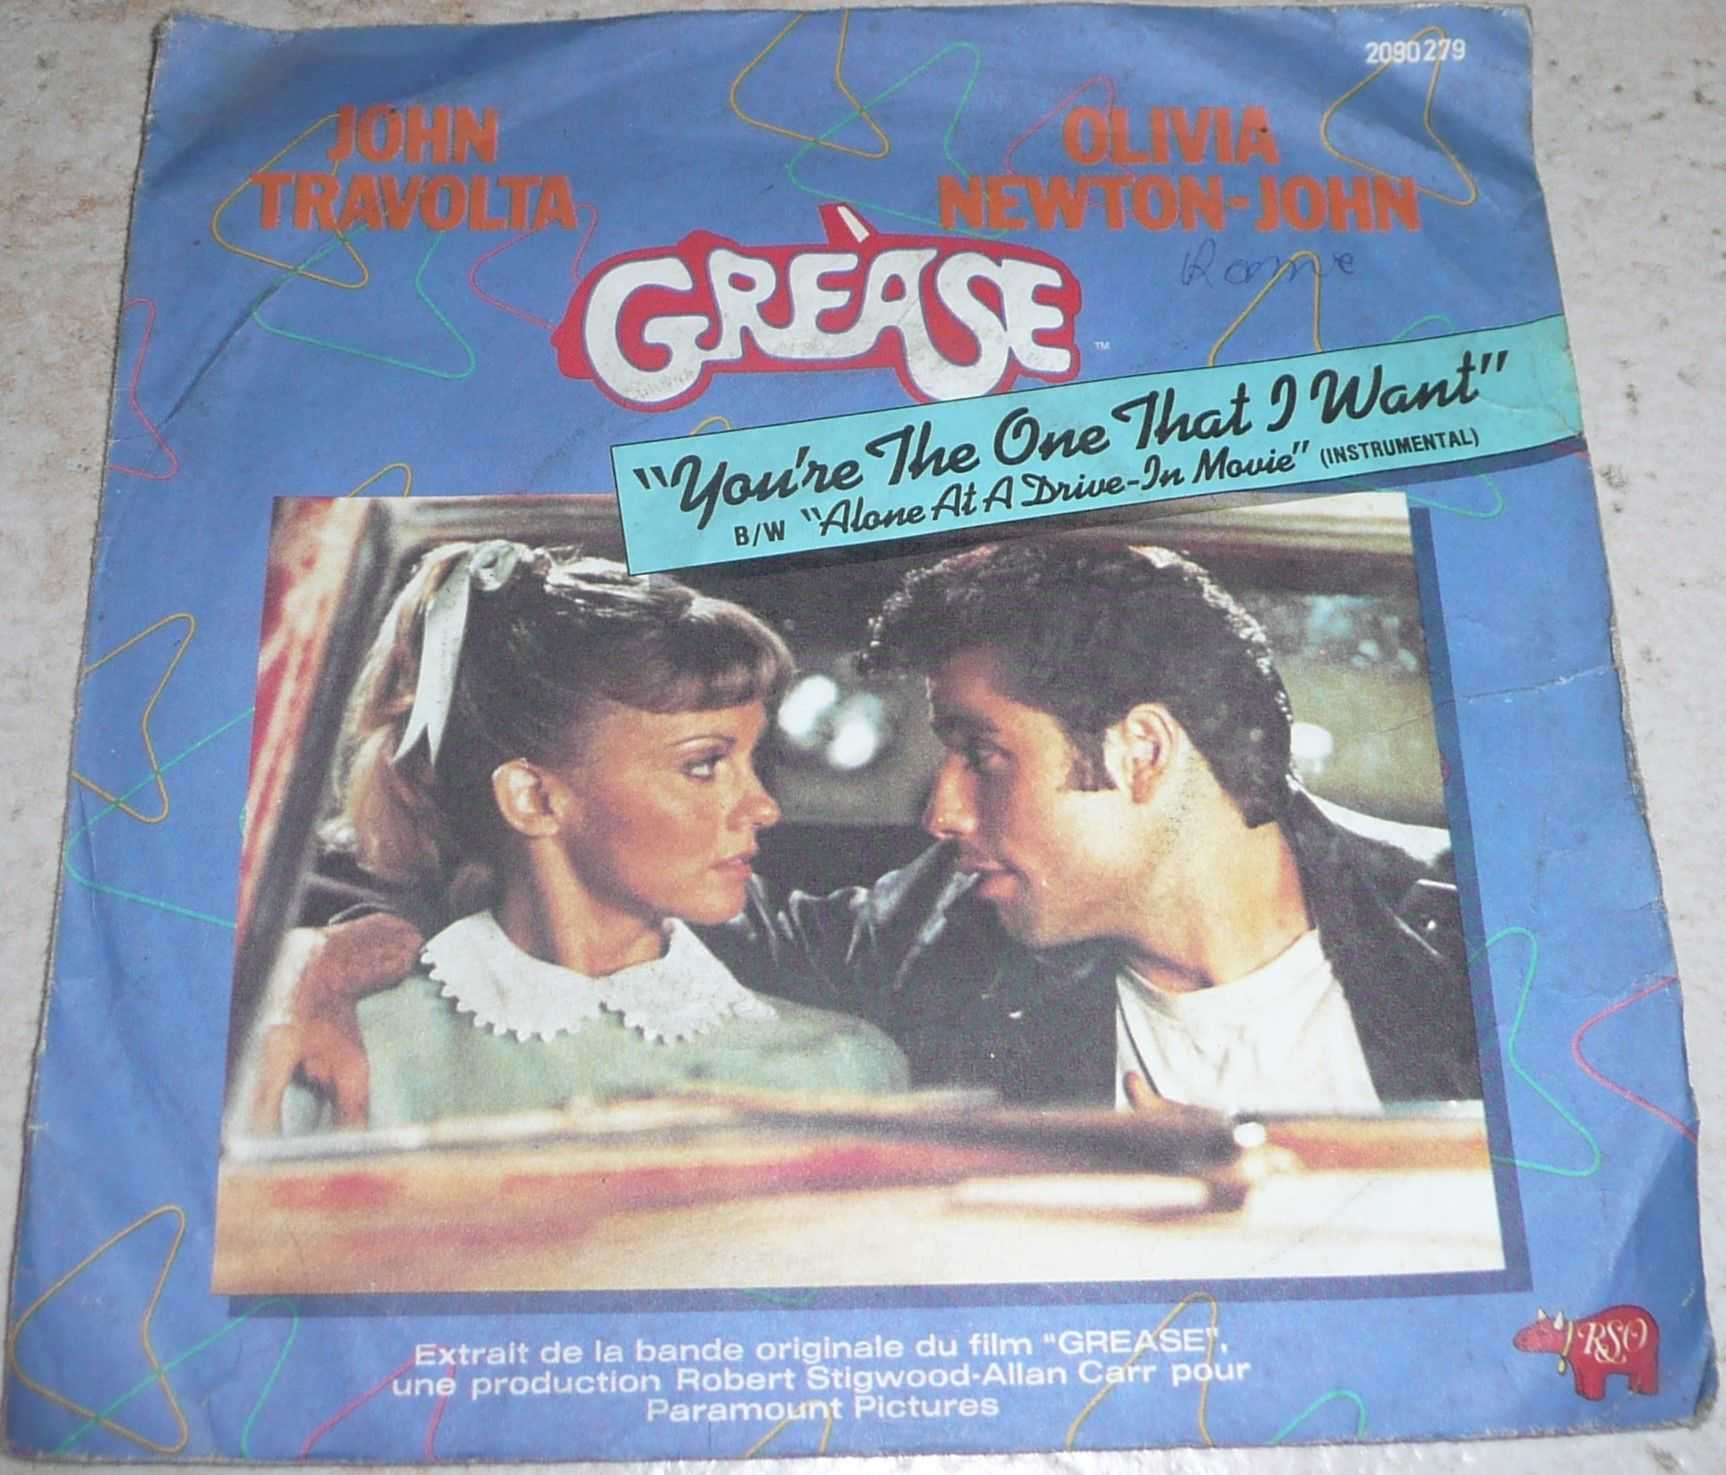 John Travolta Olivia Newton John Grease - France - John Travolta Olivia Newton John Grease... - France